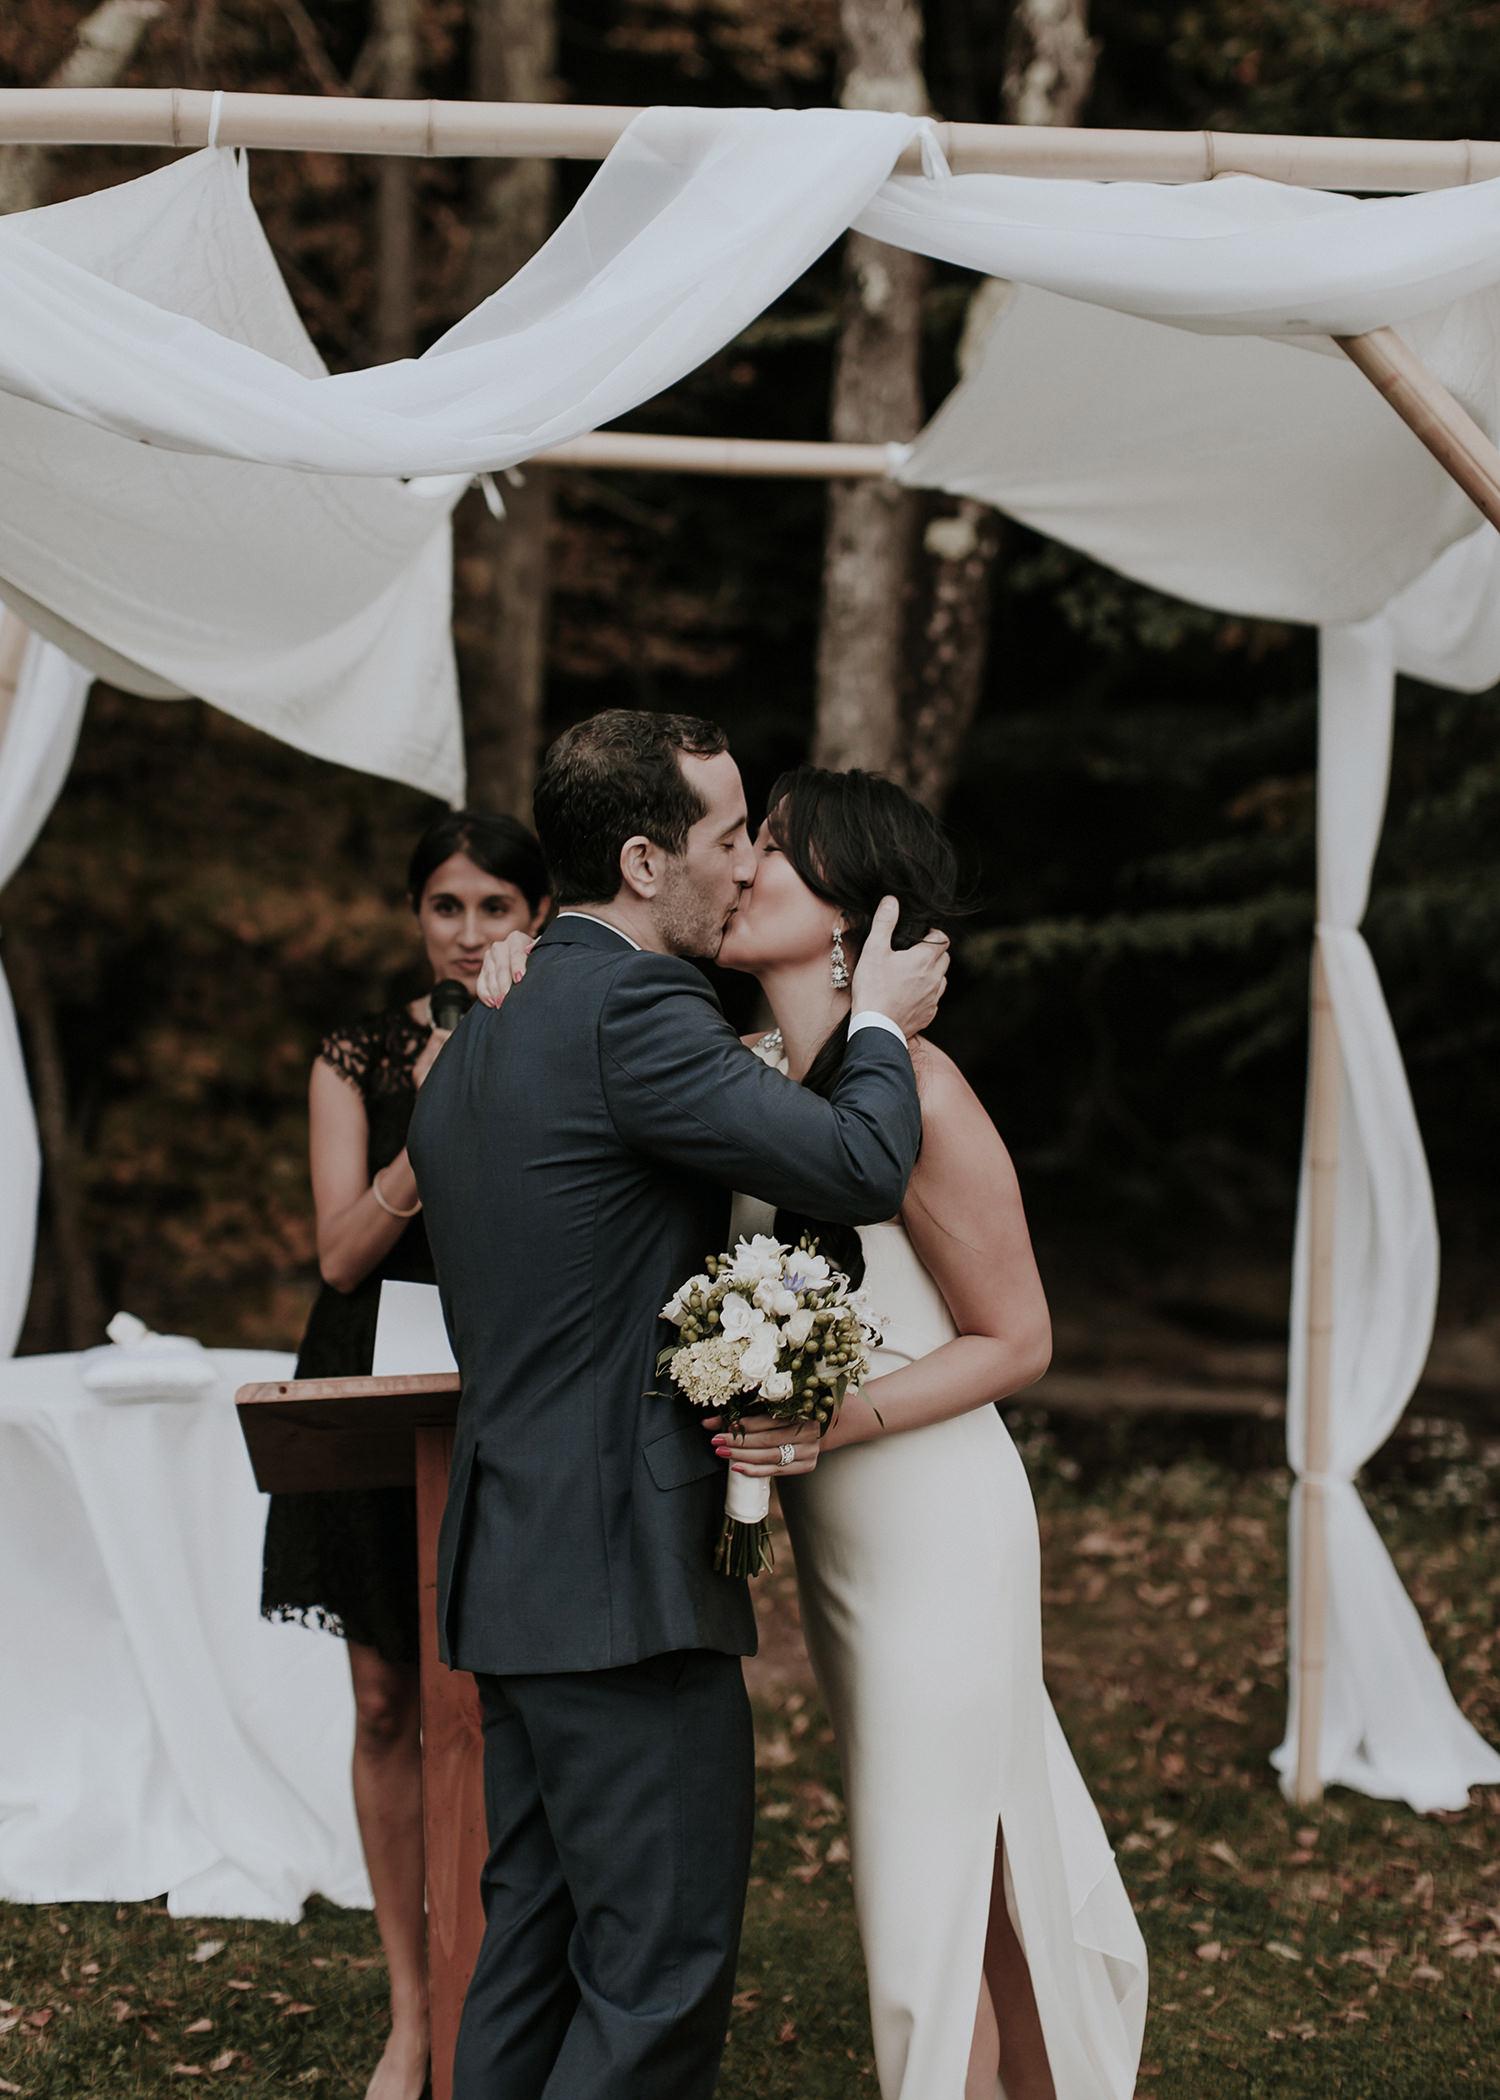 SPENCER+MELISSA-WEDDING540.jpg